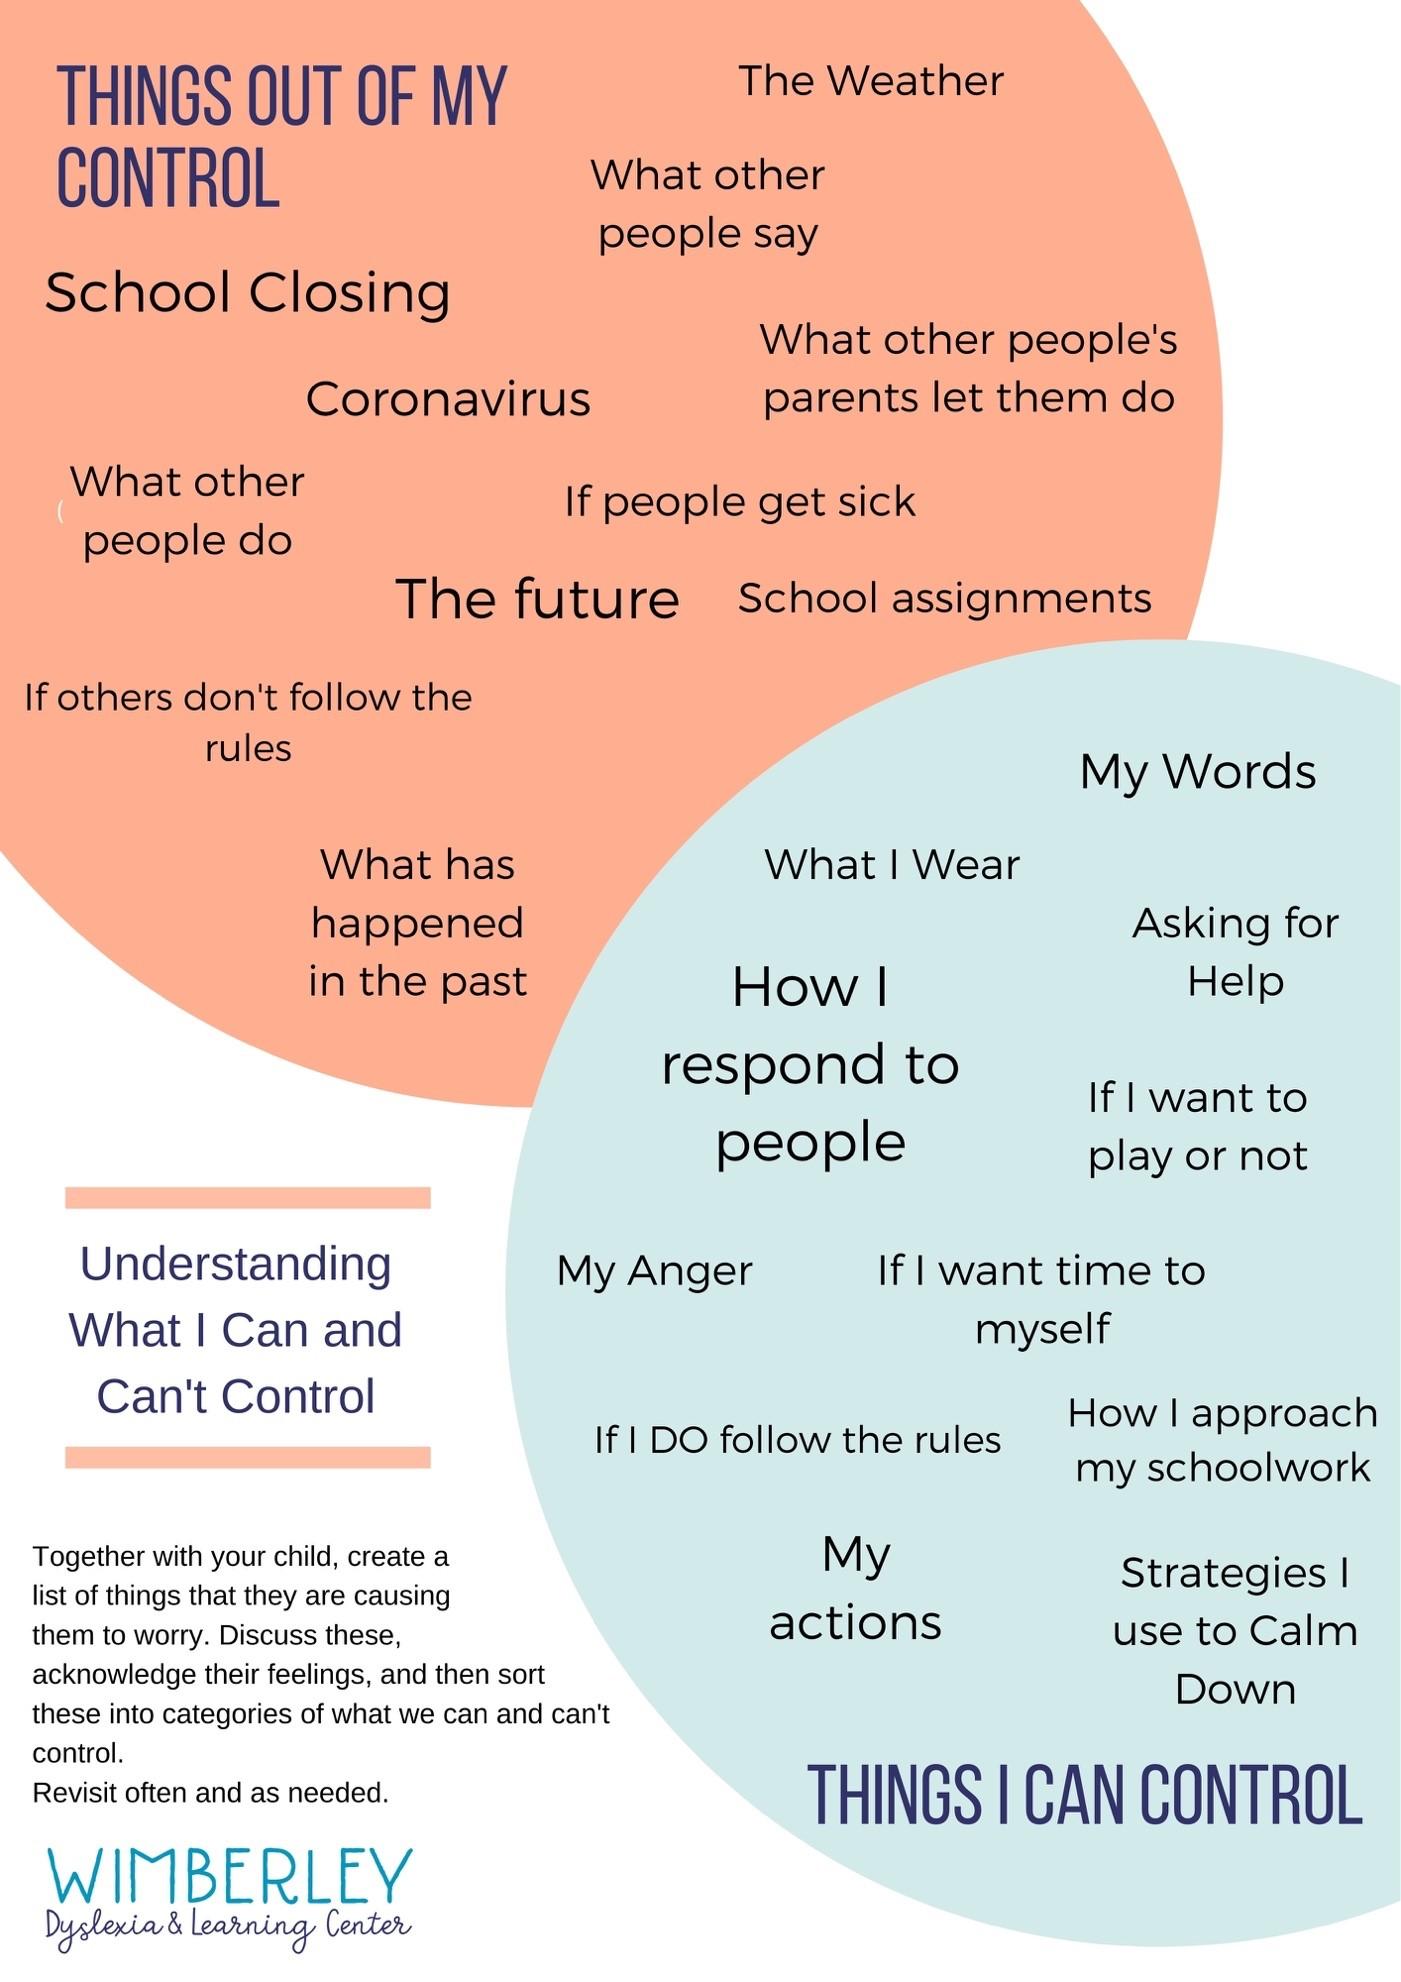 identify emotions during school closings